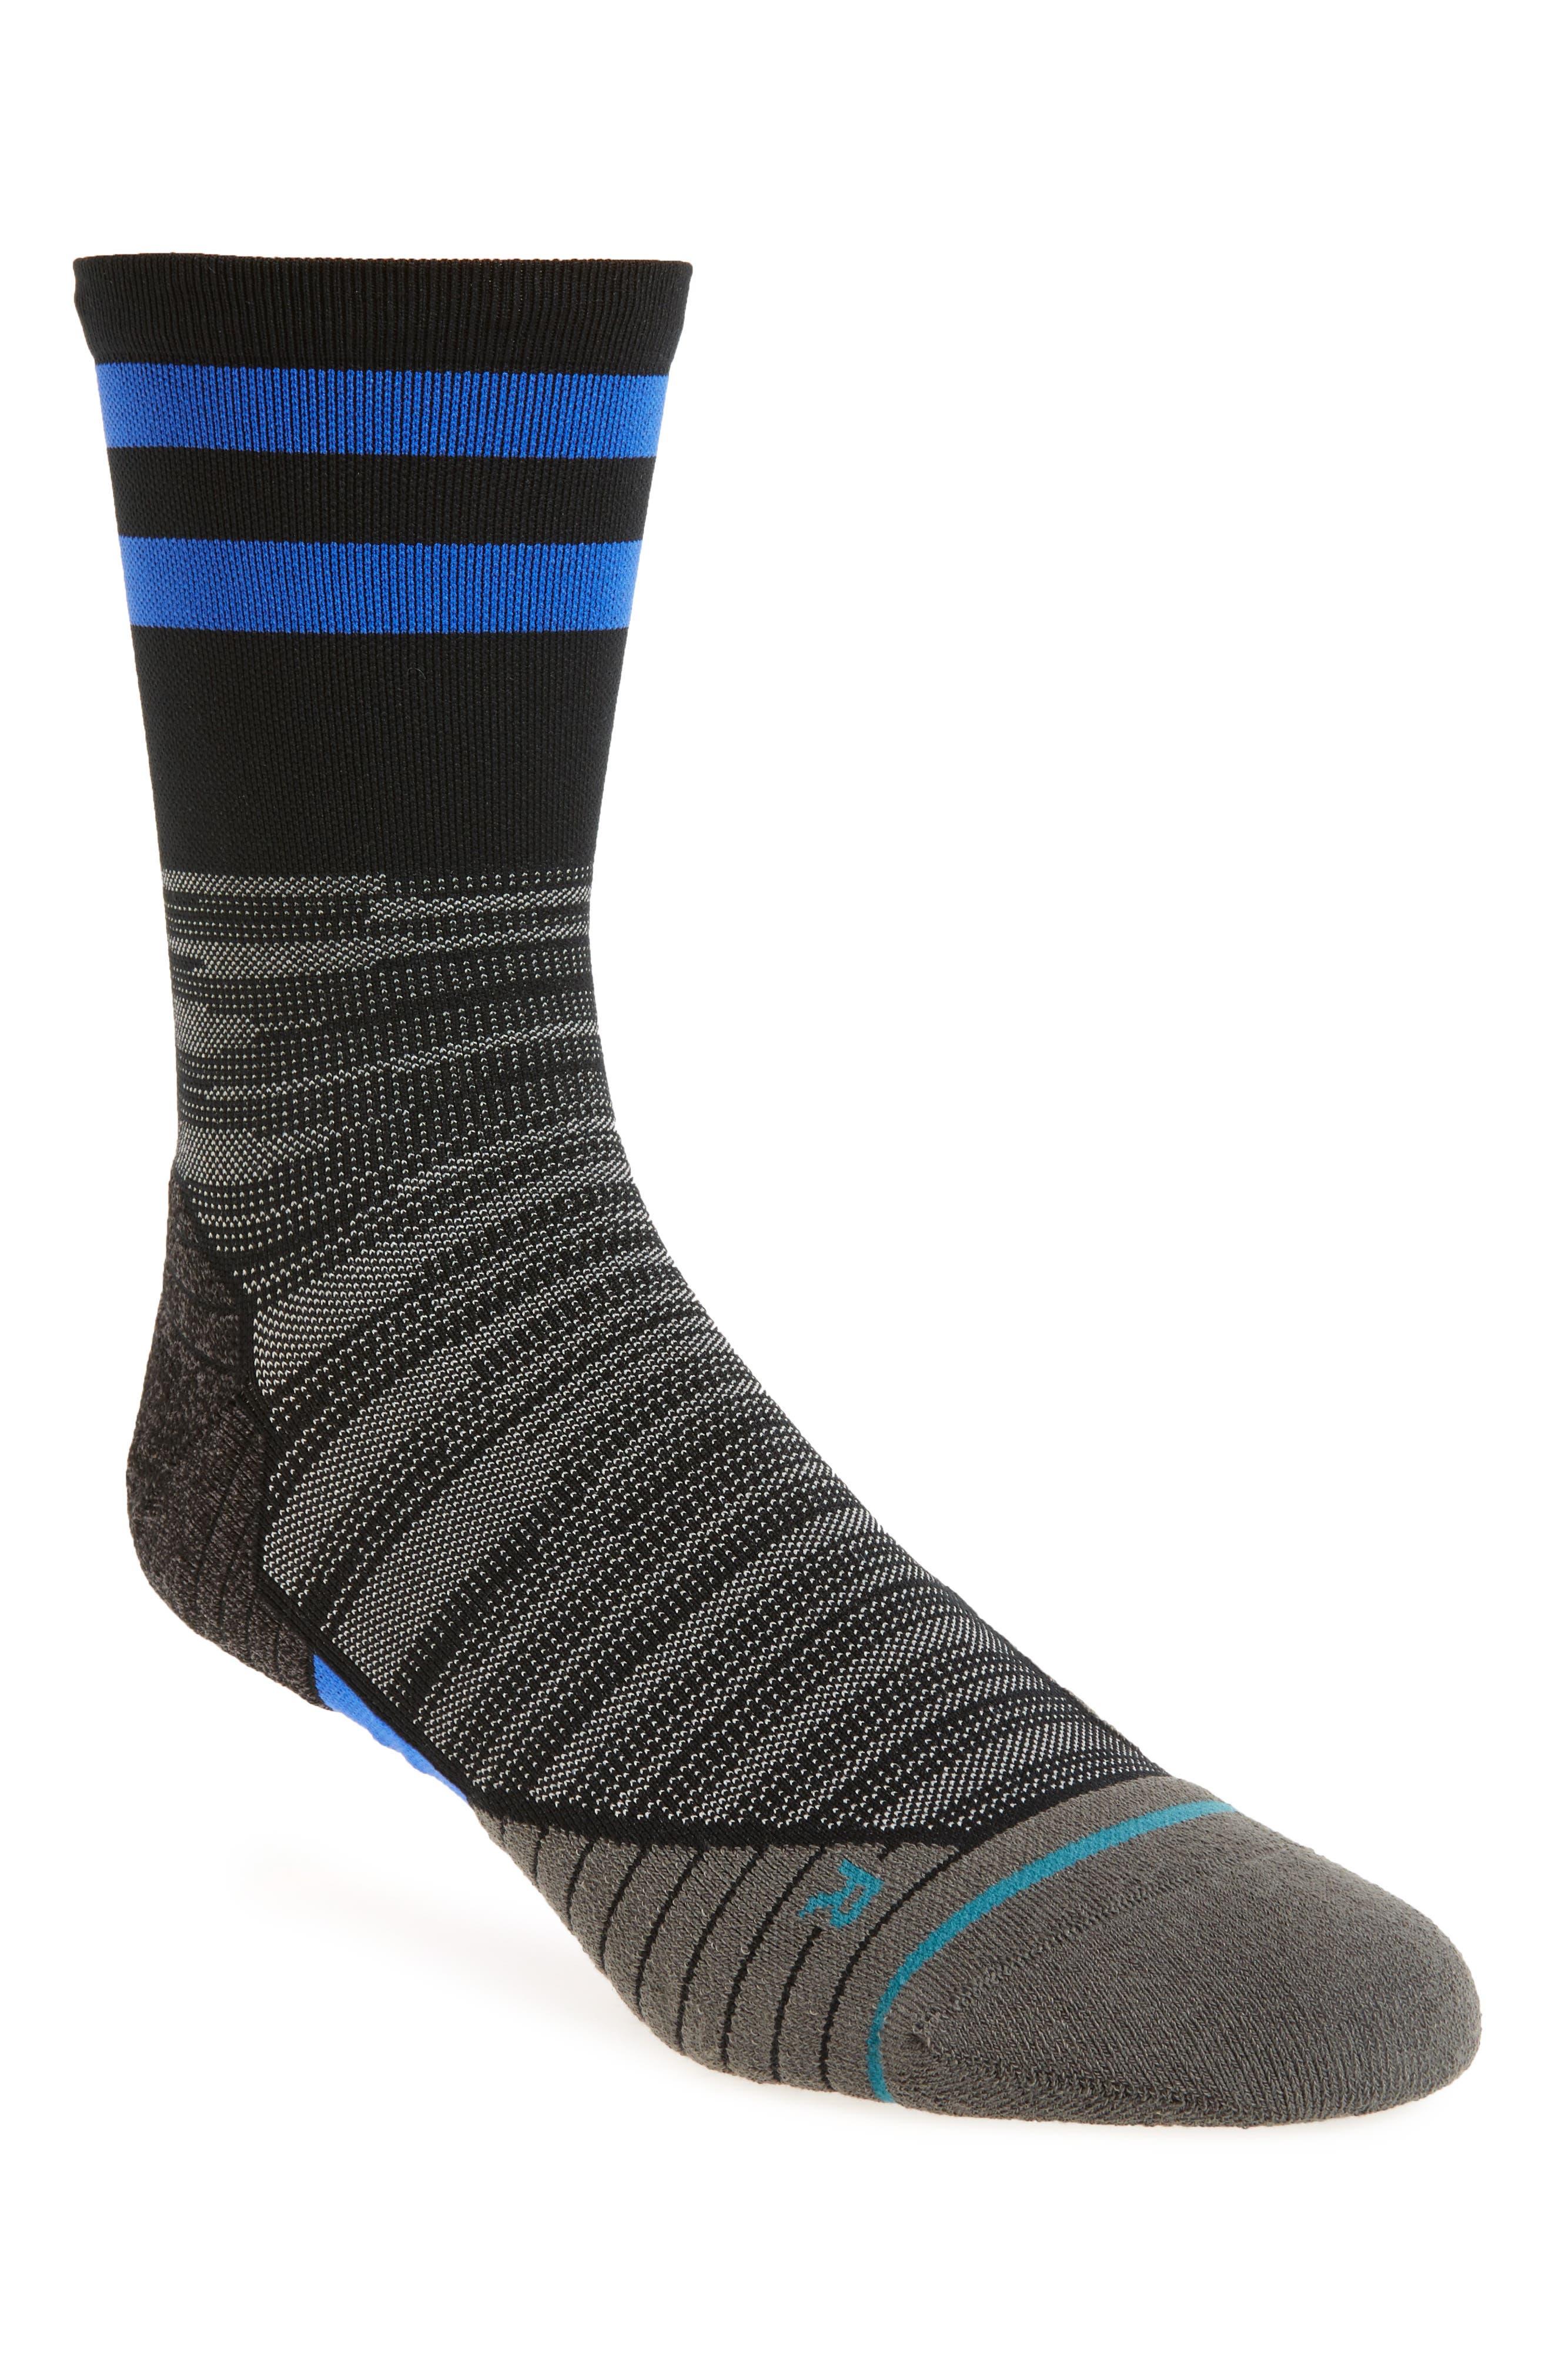 Uncommon Solids Crew Socks,                             Main thumbnail 1, color,                             001